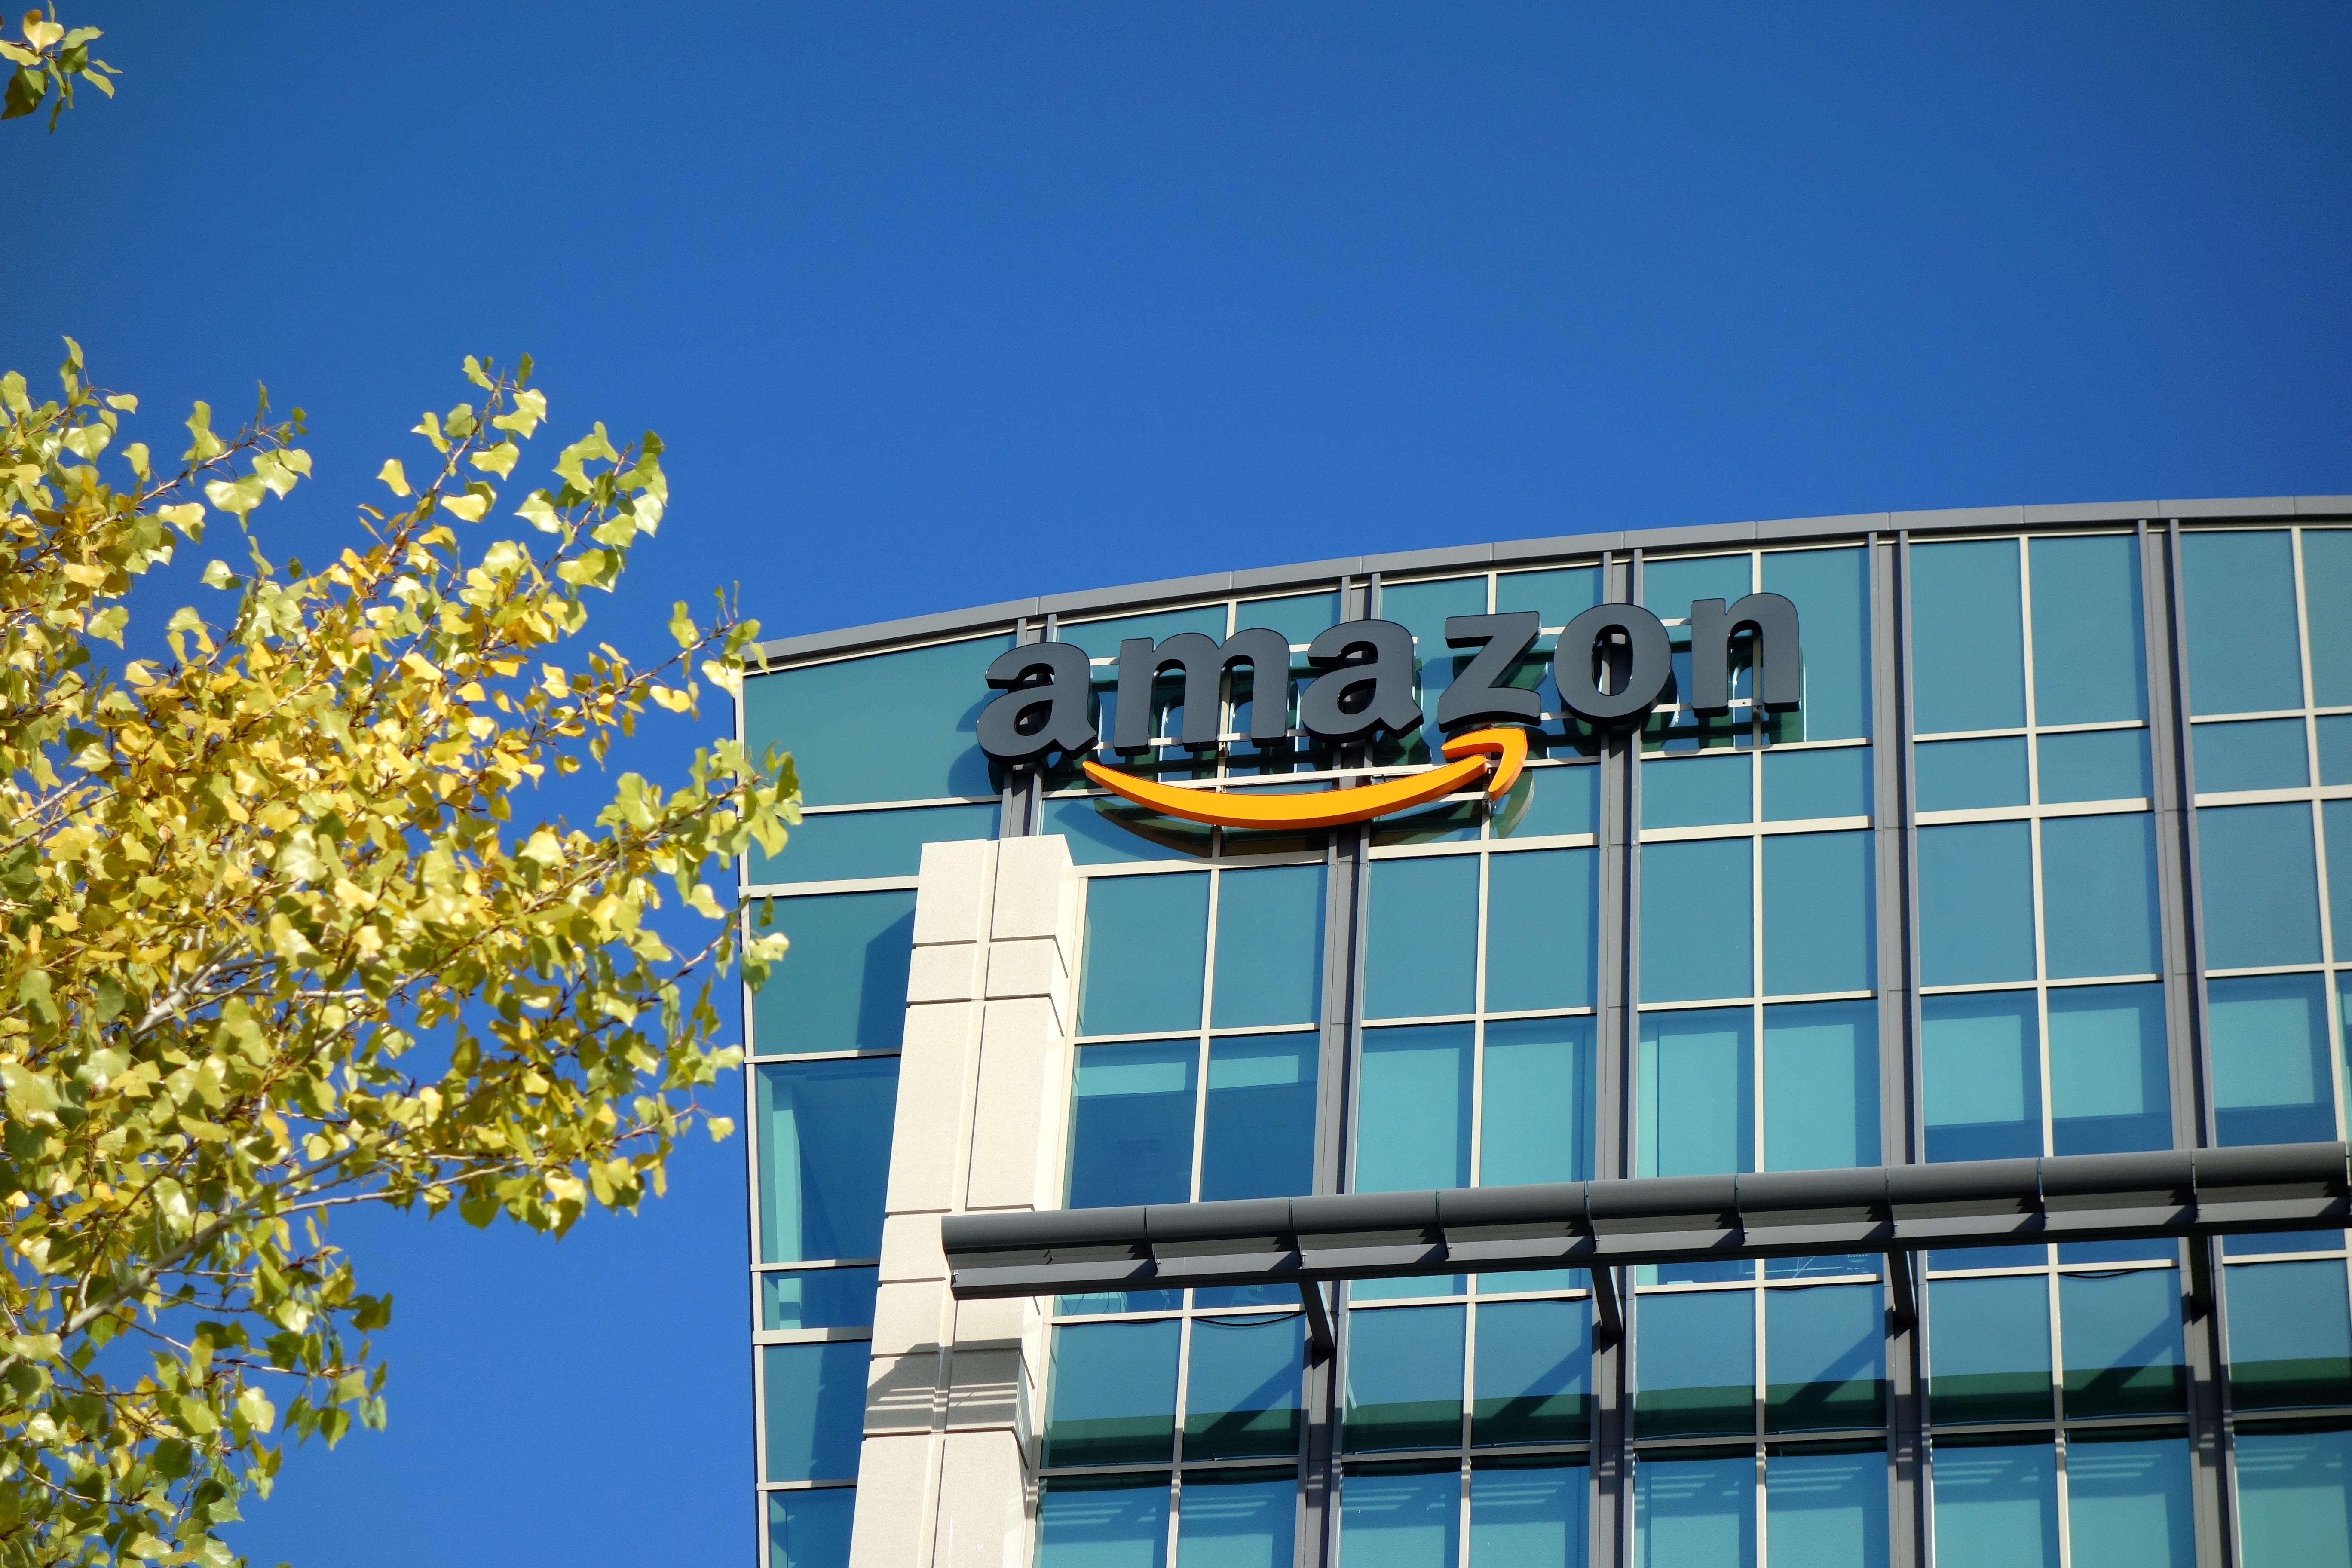 Amazon corporate office building in Sunnyvale, California.